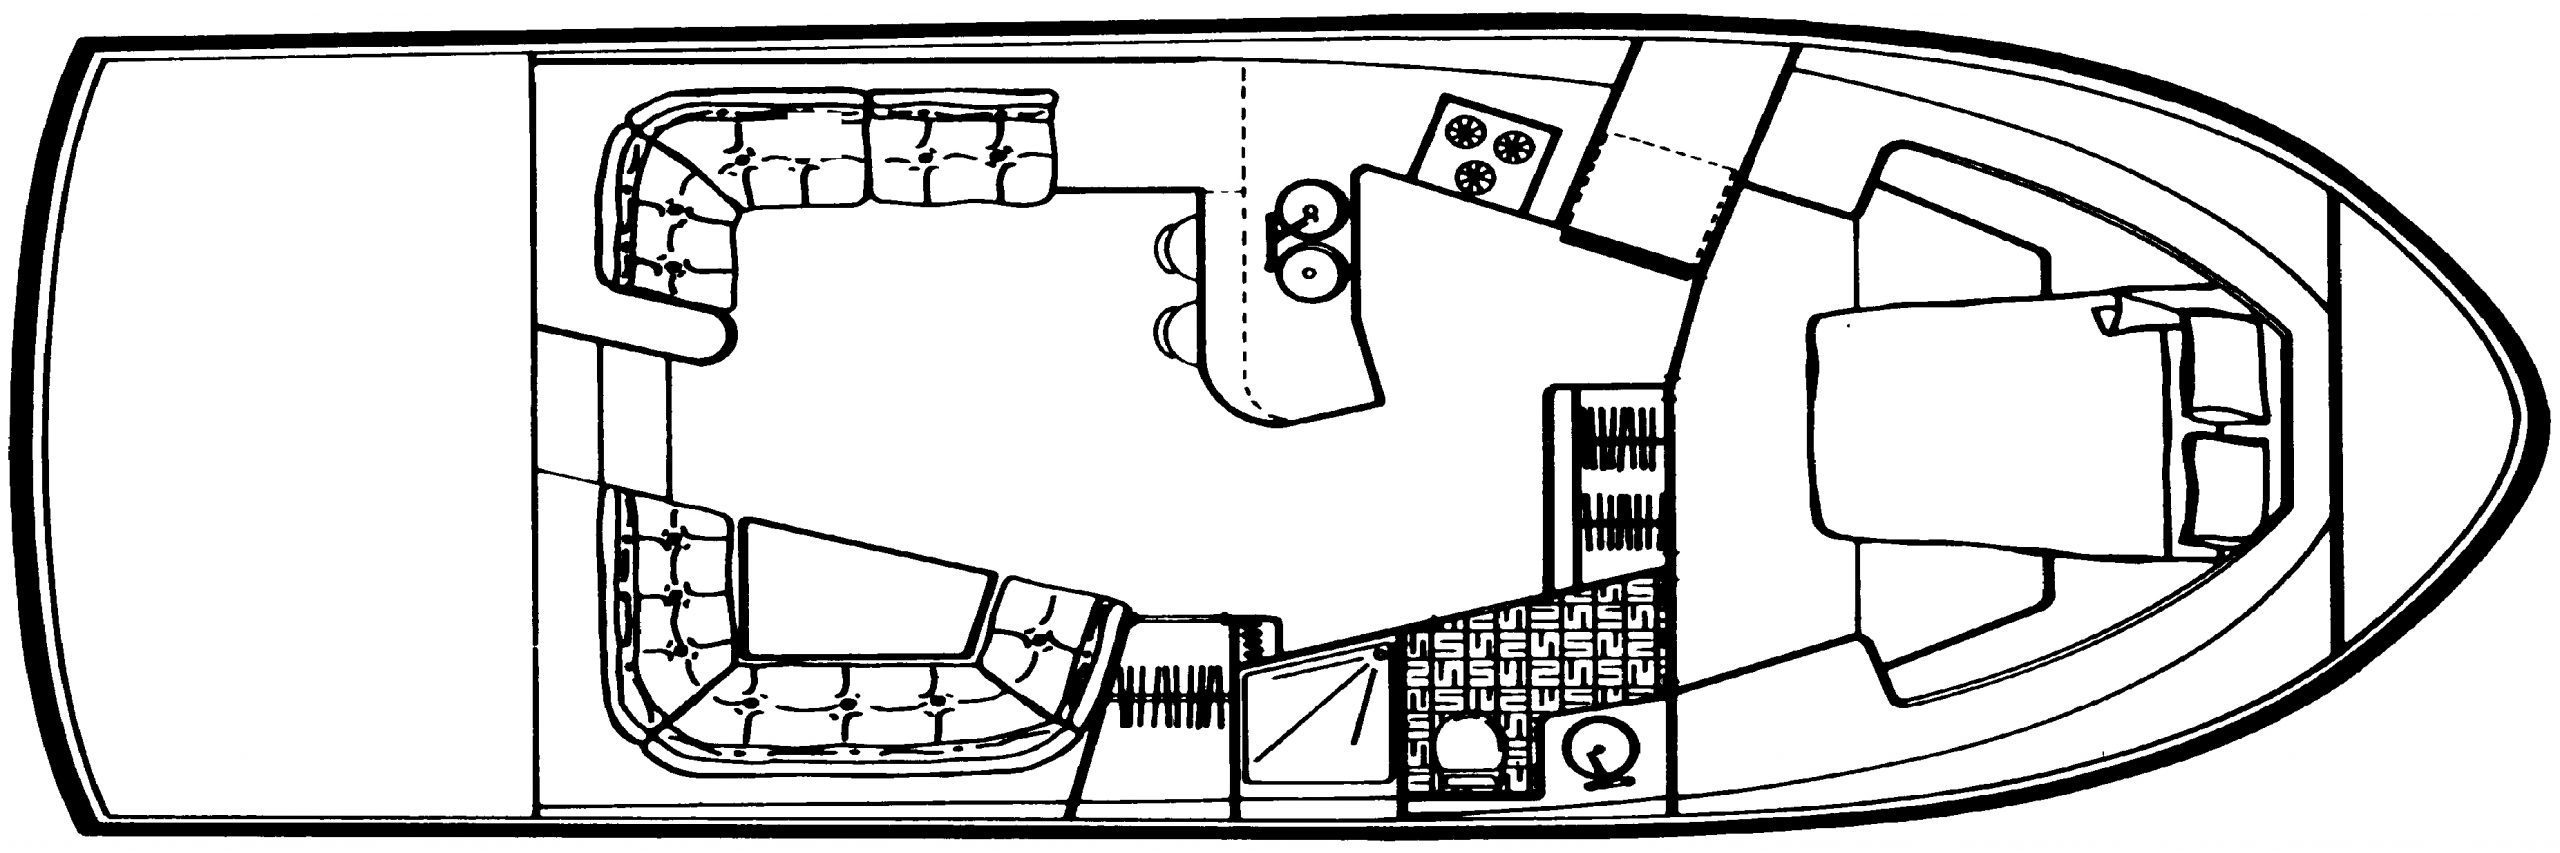 3867 Santego Floor Plan 2